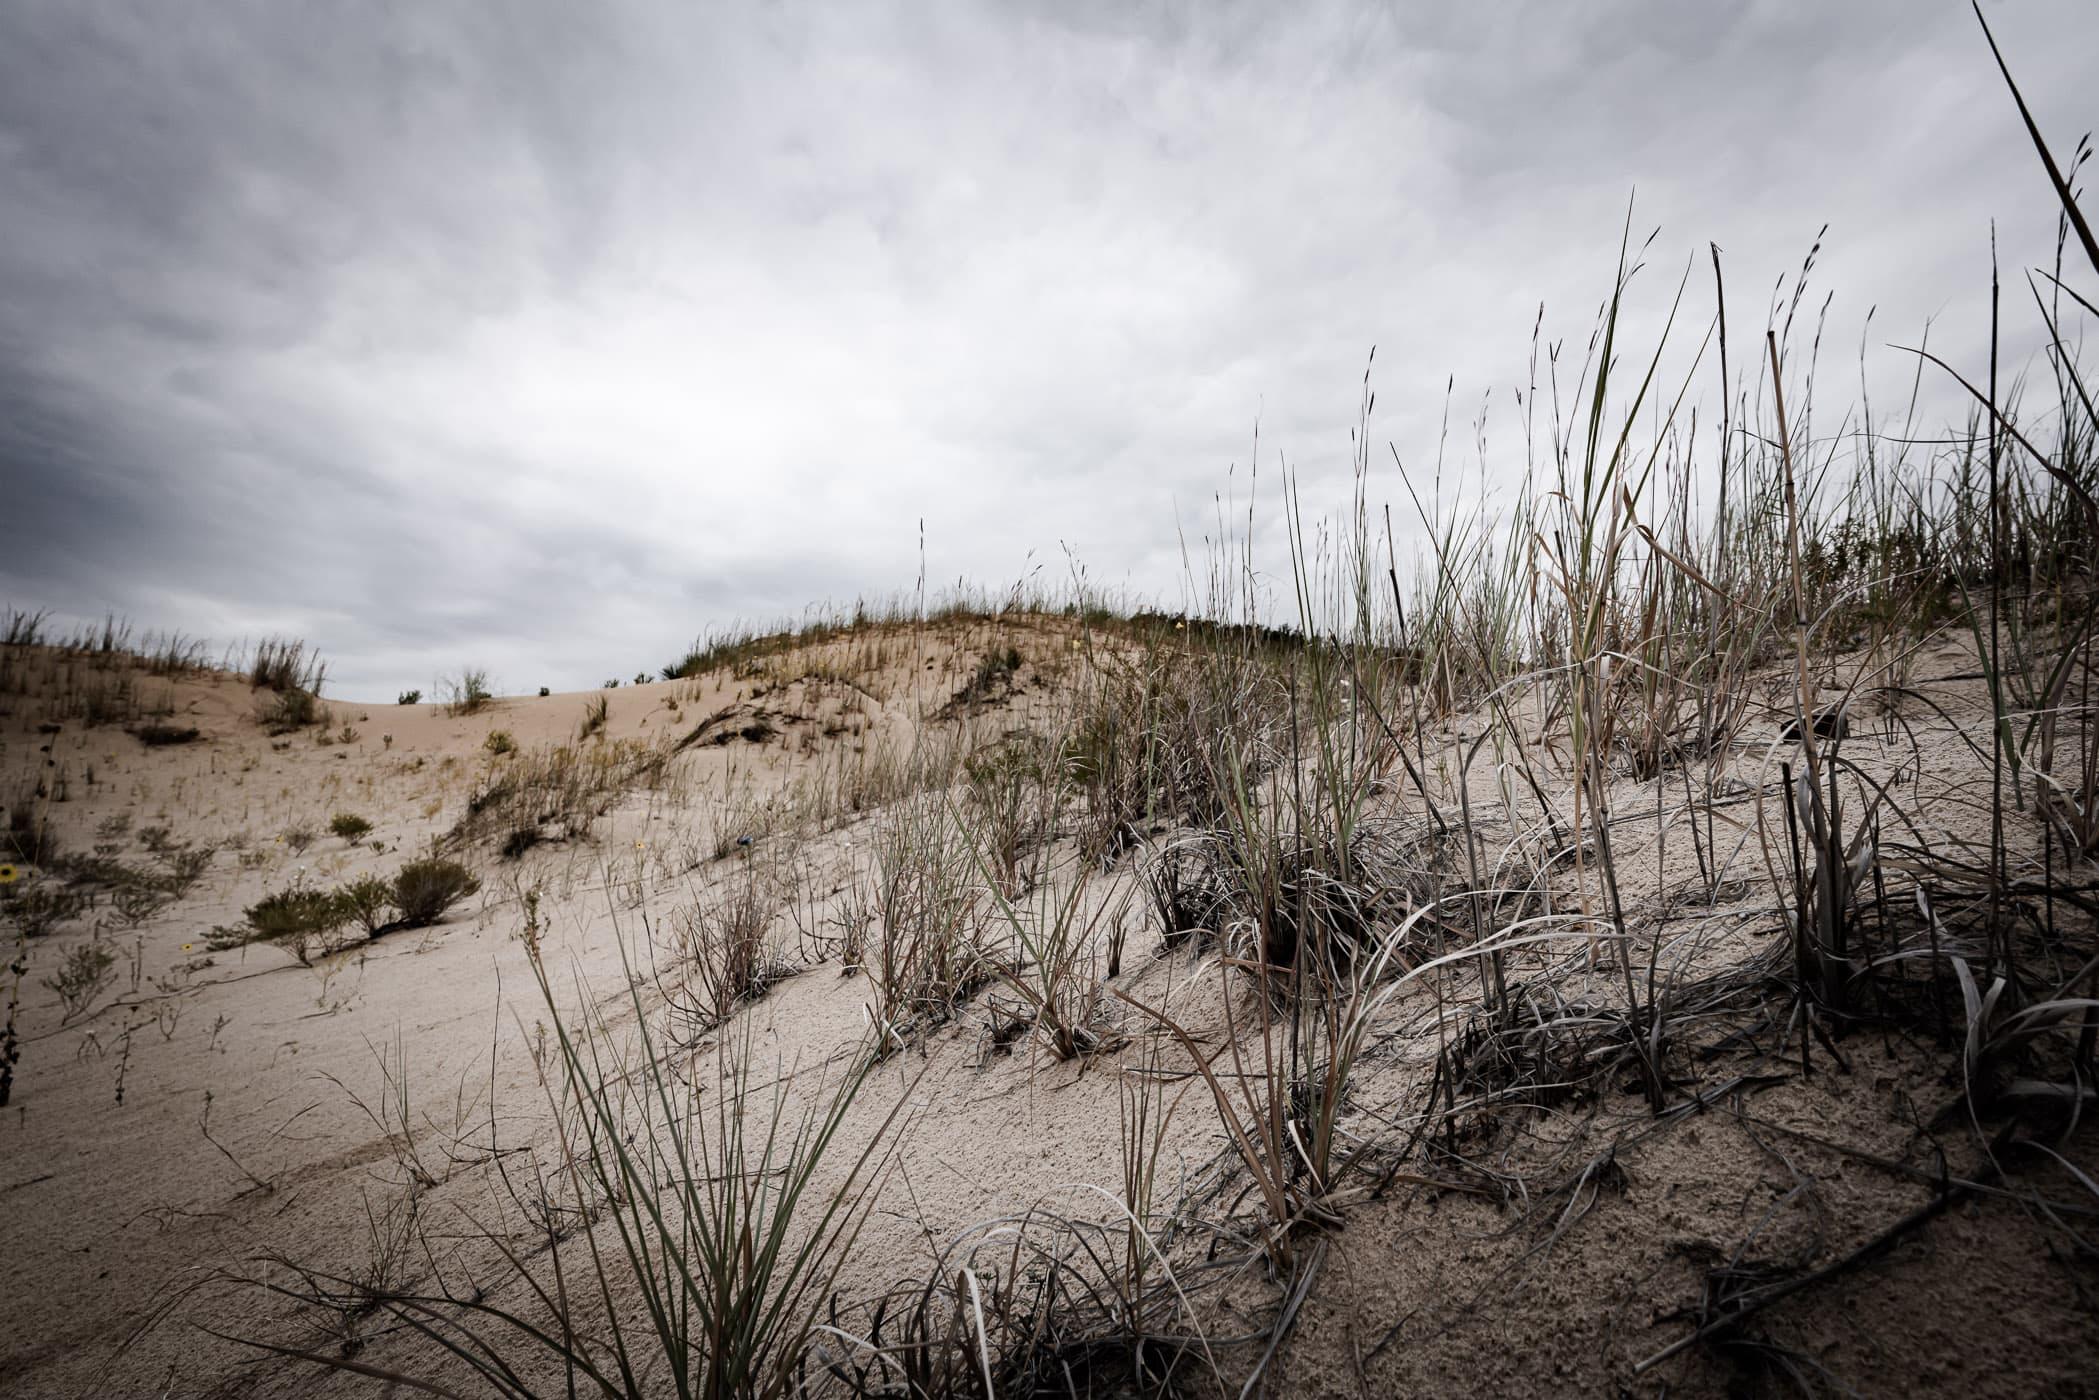 Desert plants grow amongst the dunes at West Texas' Monahans Sandhills State Park.